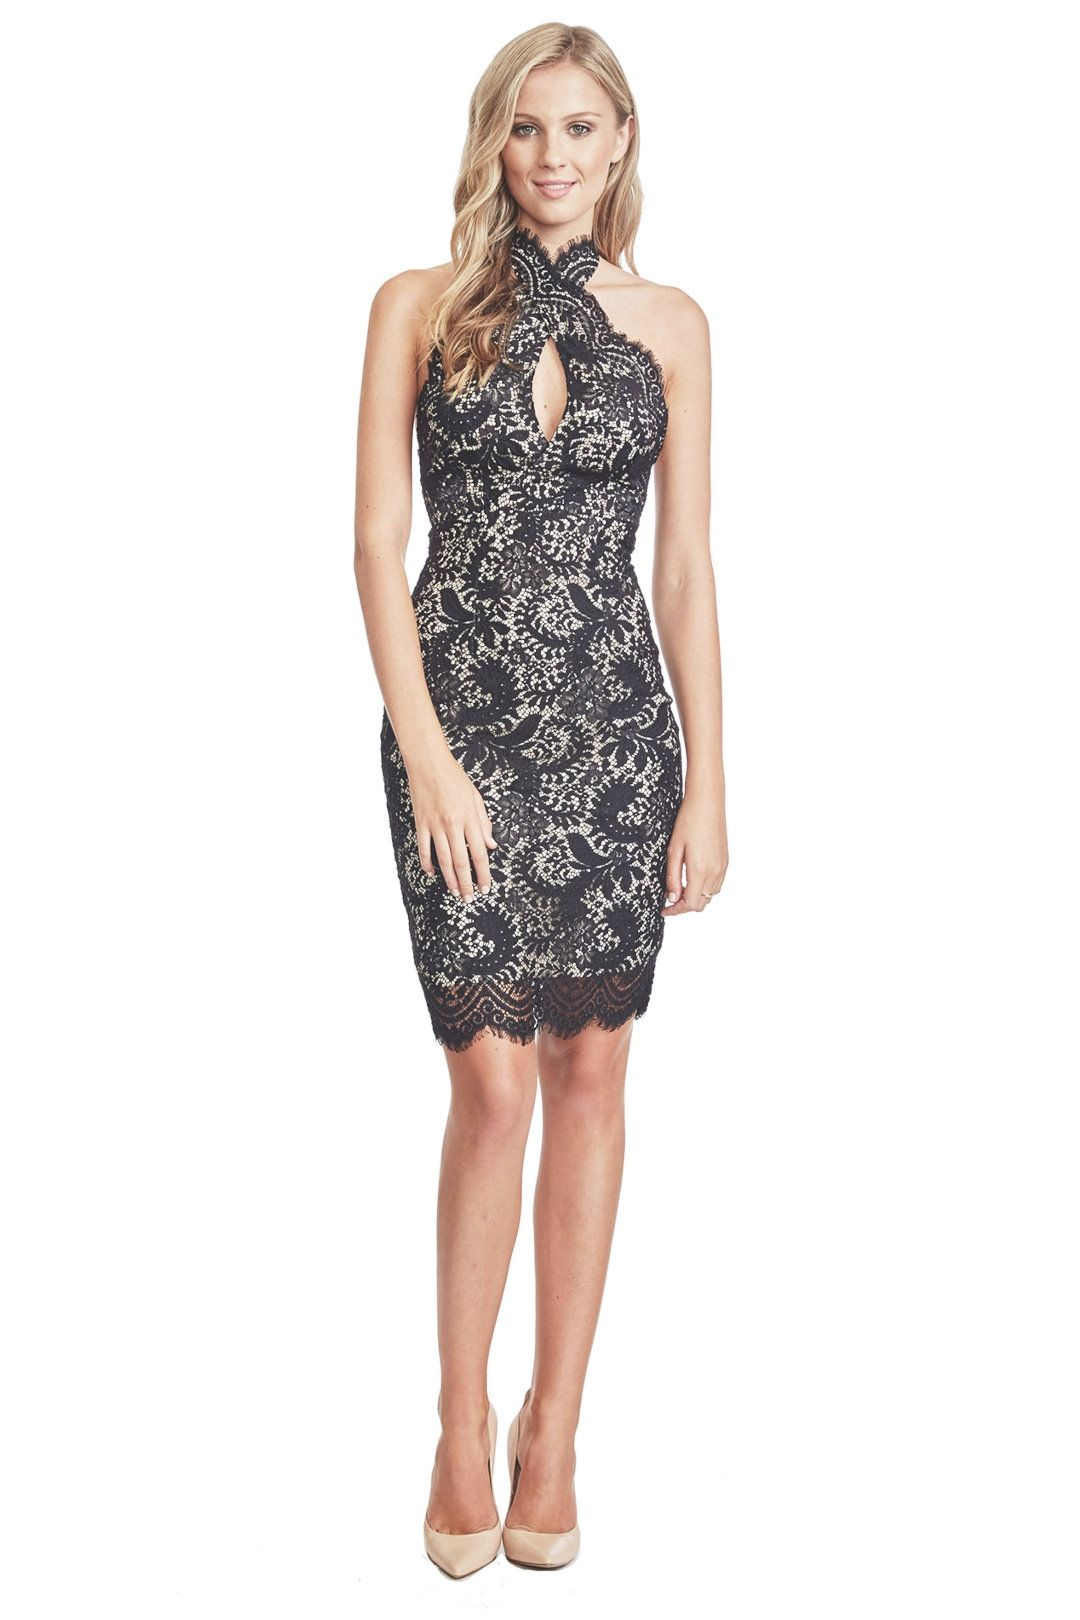 Lover - Mia Twist Dress - Black Lace - Front